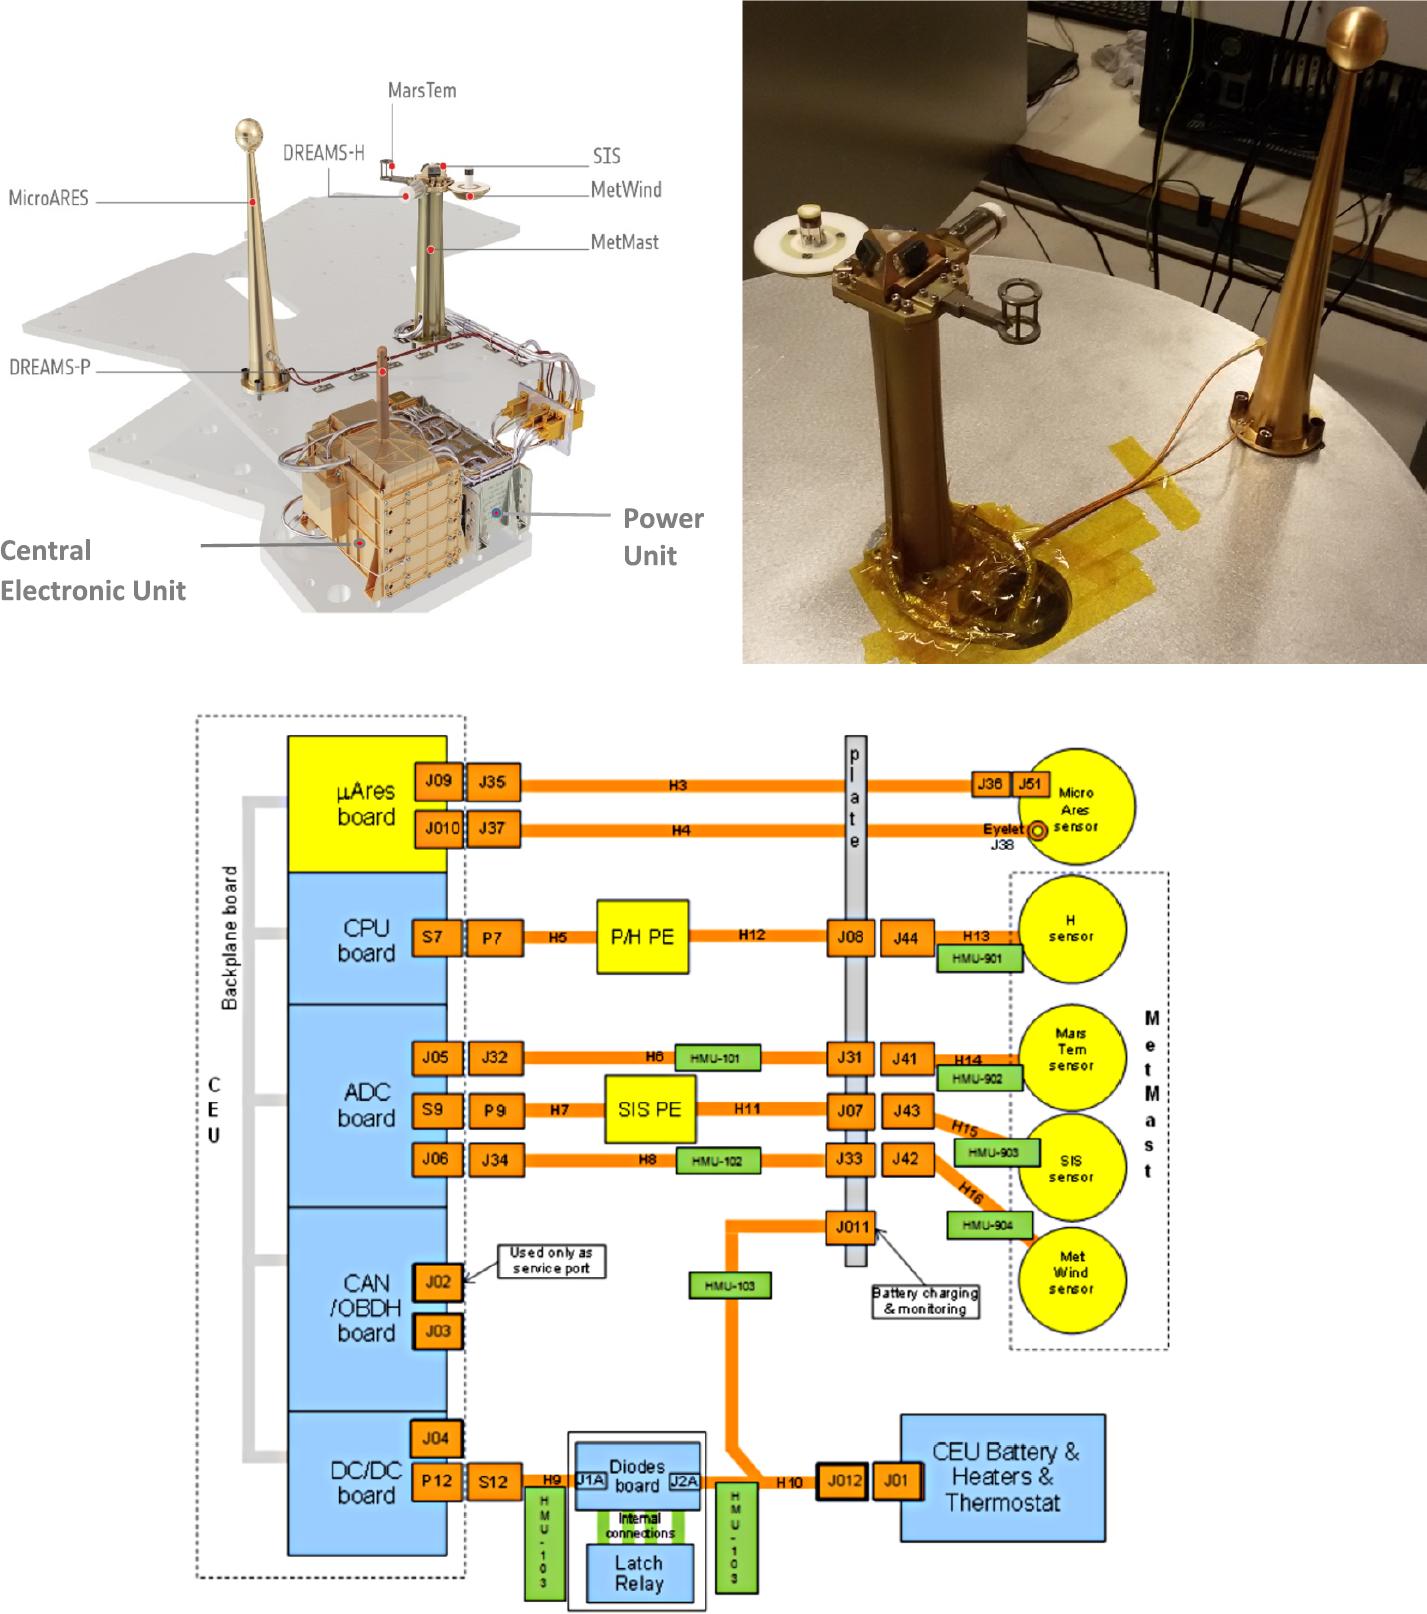 The Dreams Experiment Onboard Schiaparelli Module Of Exomars Bare Board Printed Circuit Boards Phoenix Dynamics Open Image In New Window